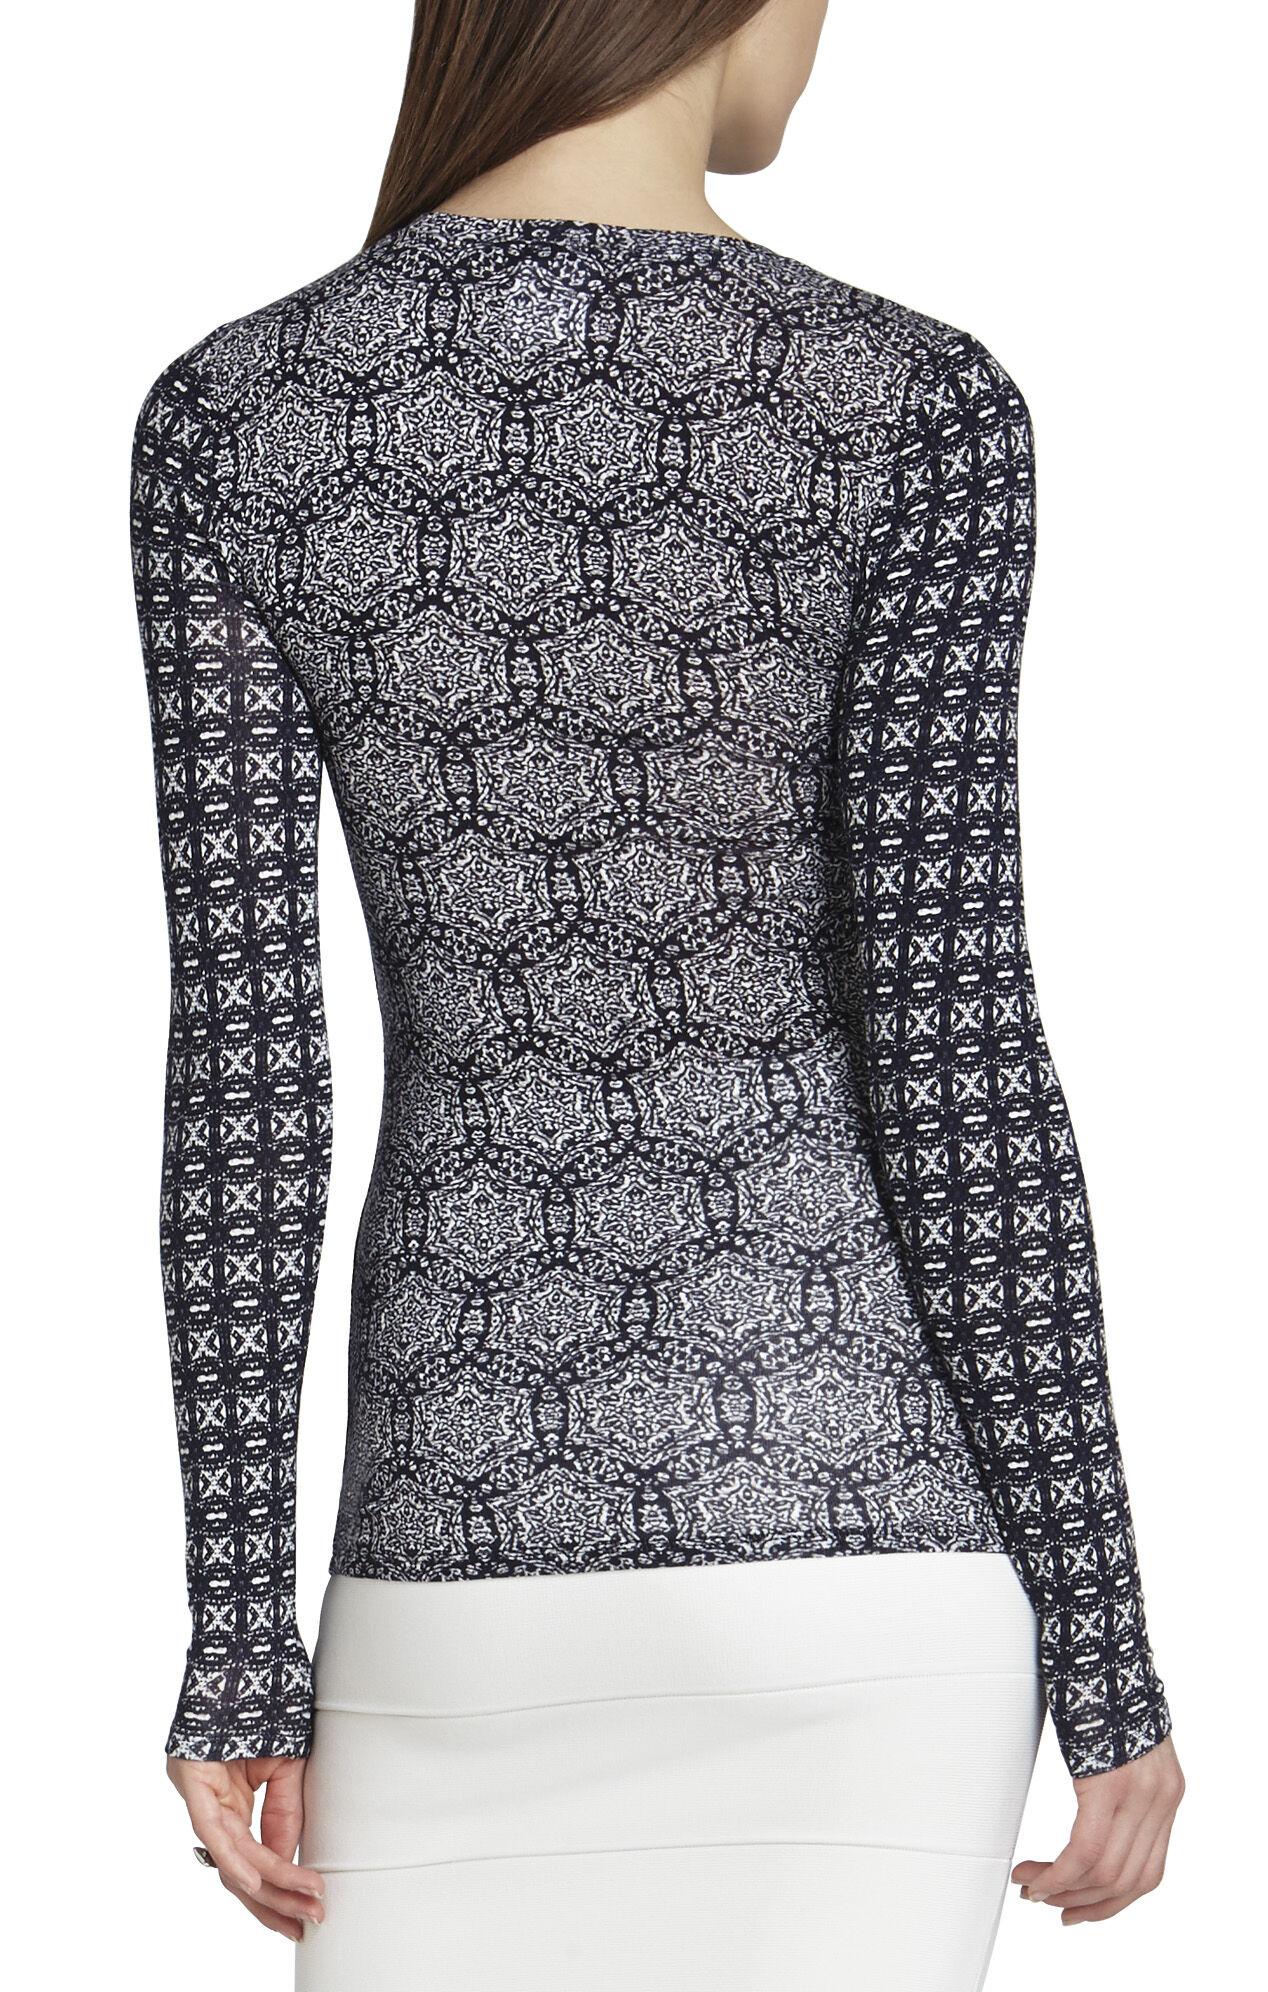 Agda Long-Sleeve Top